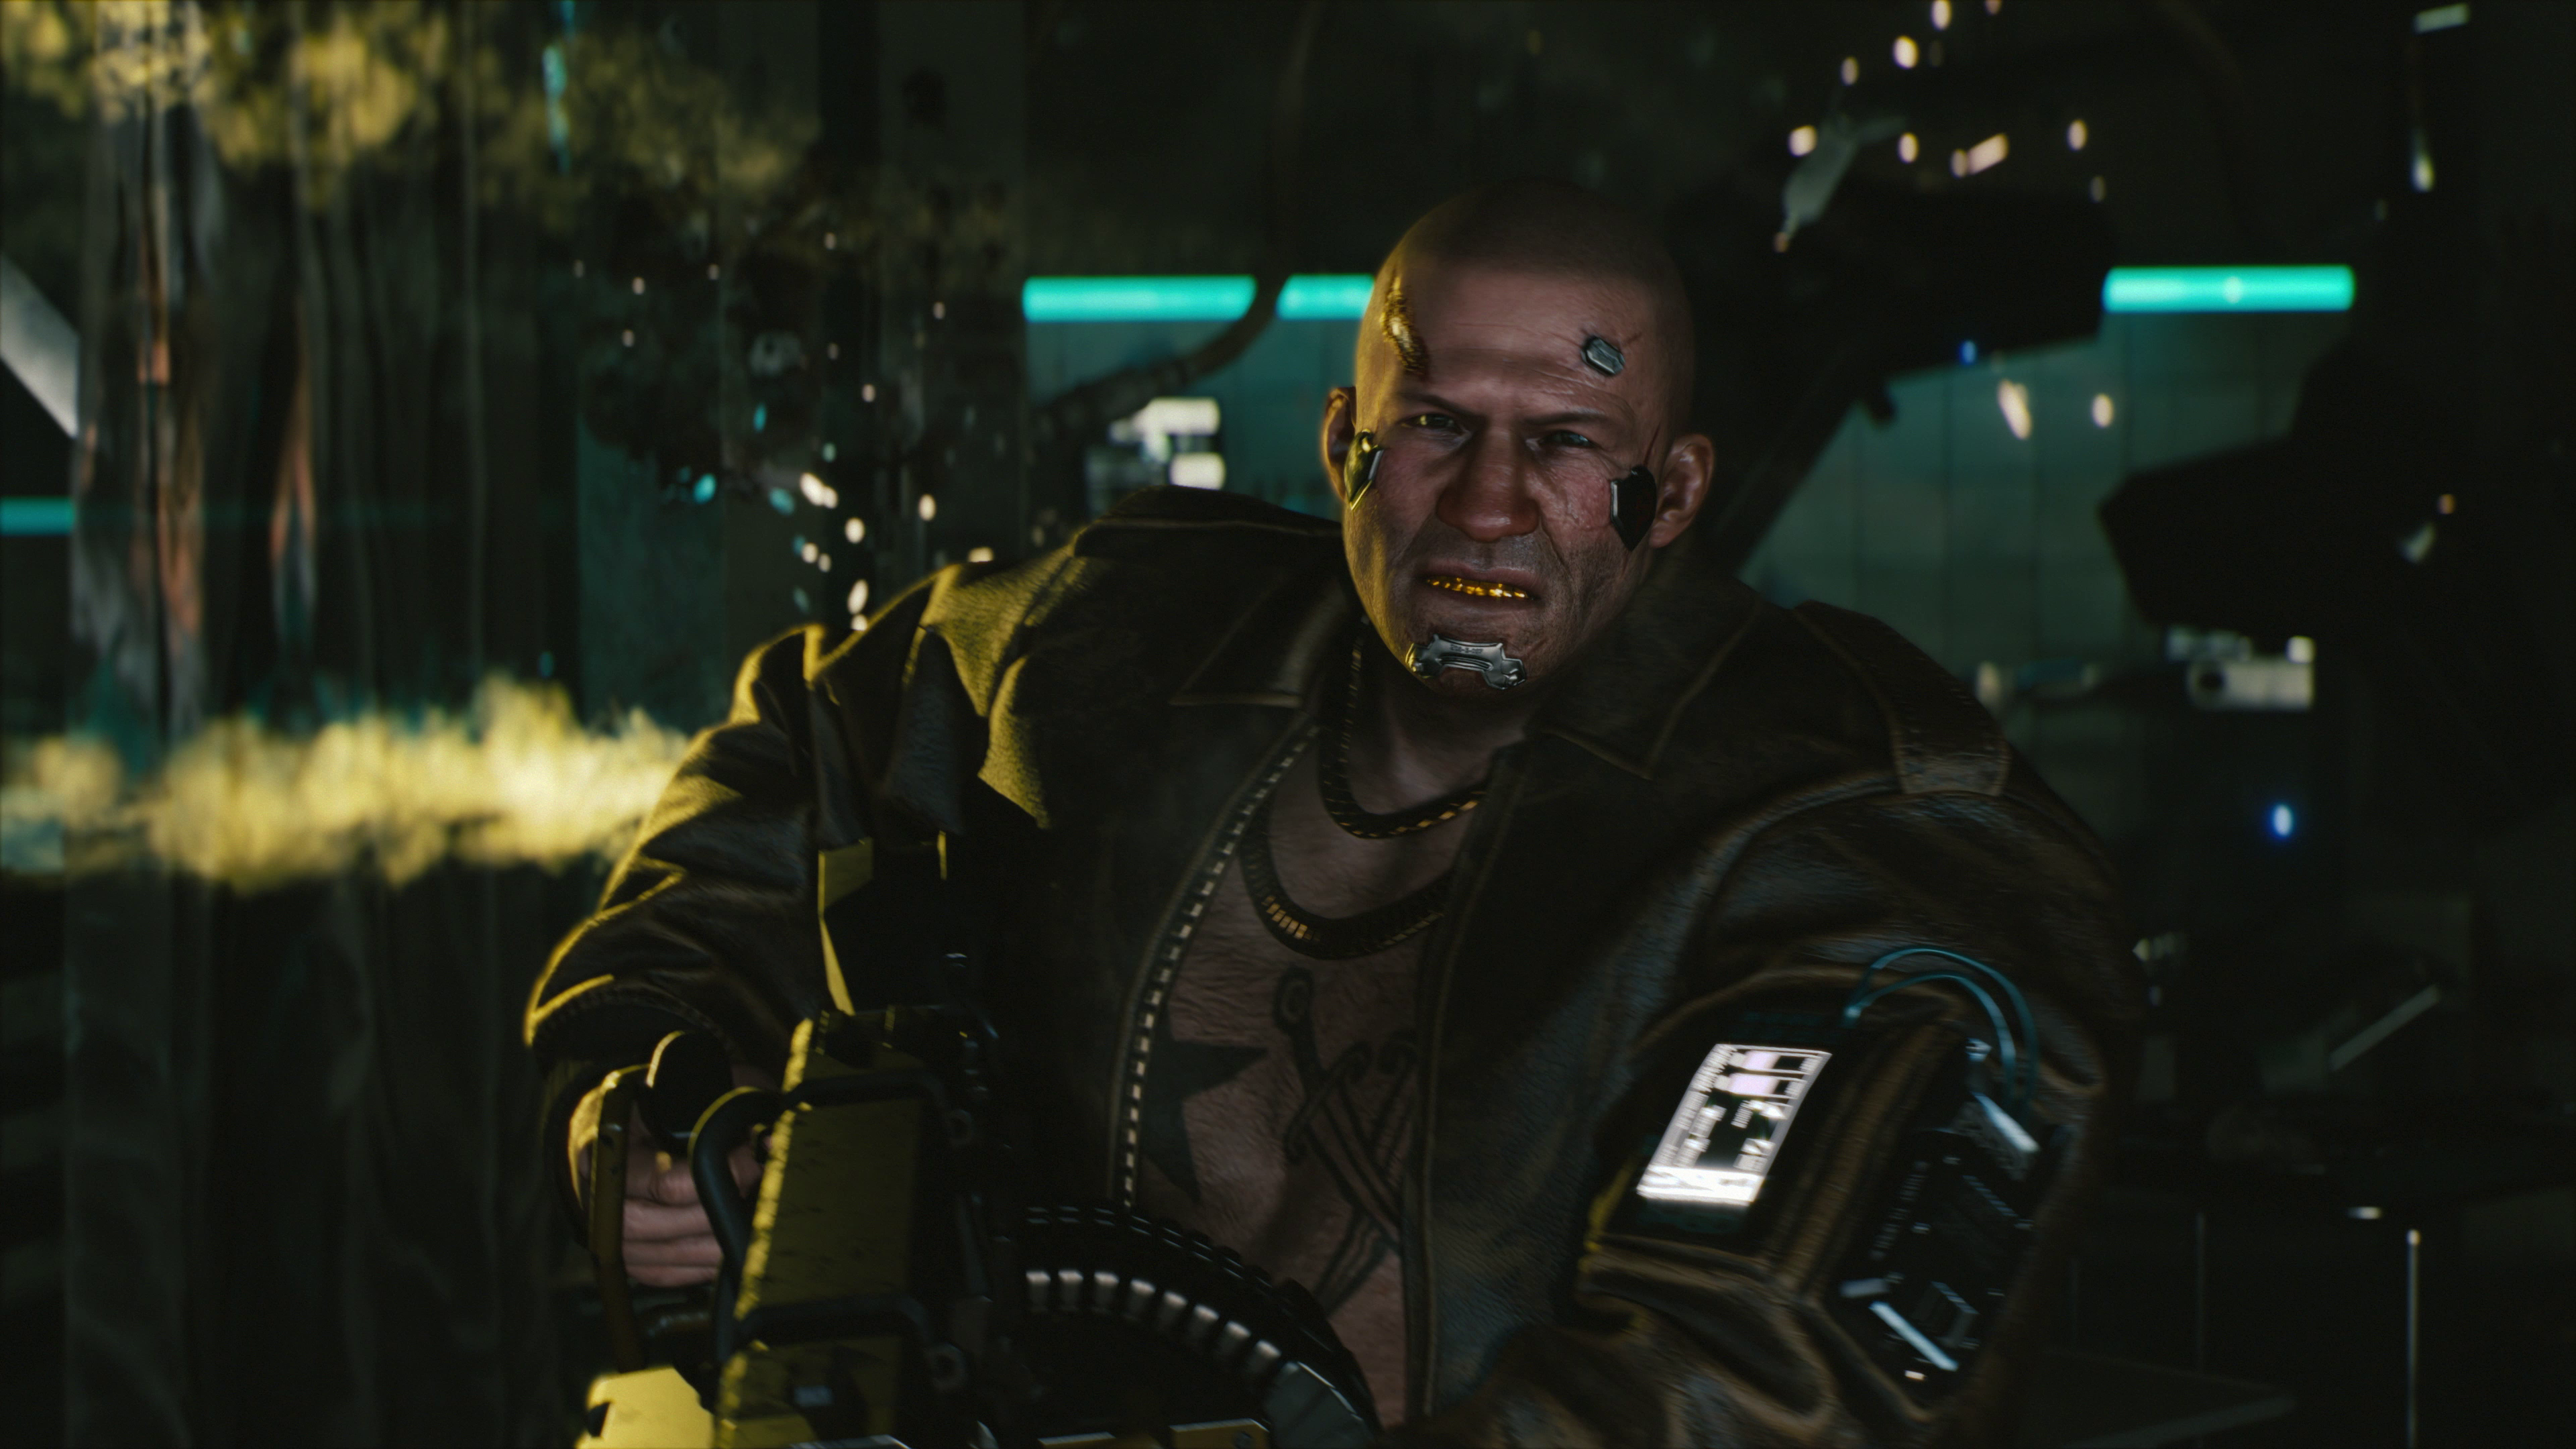 Cyberpunk 2077 E3 2018 Trailer Frame By Frame Ep07